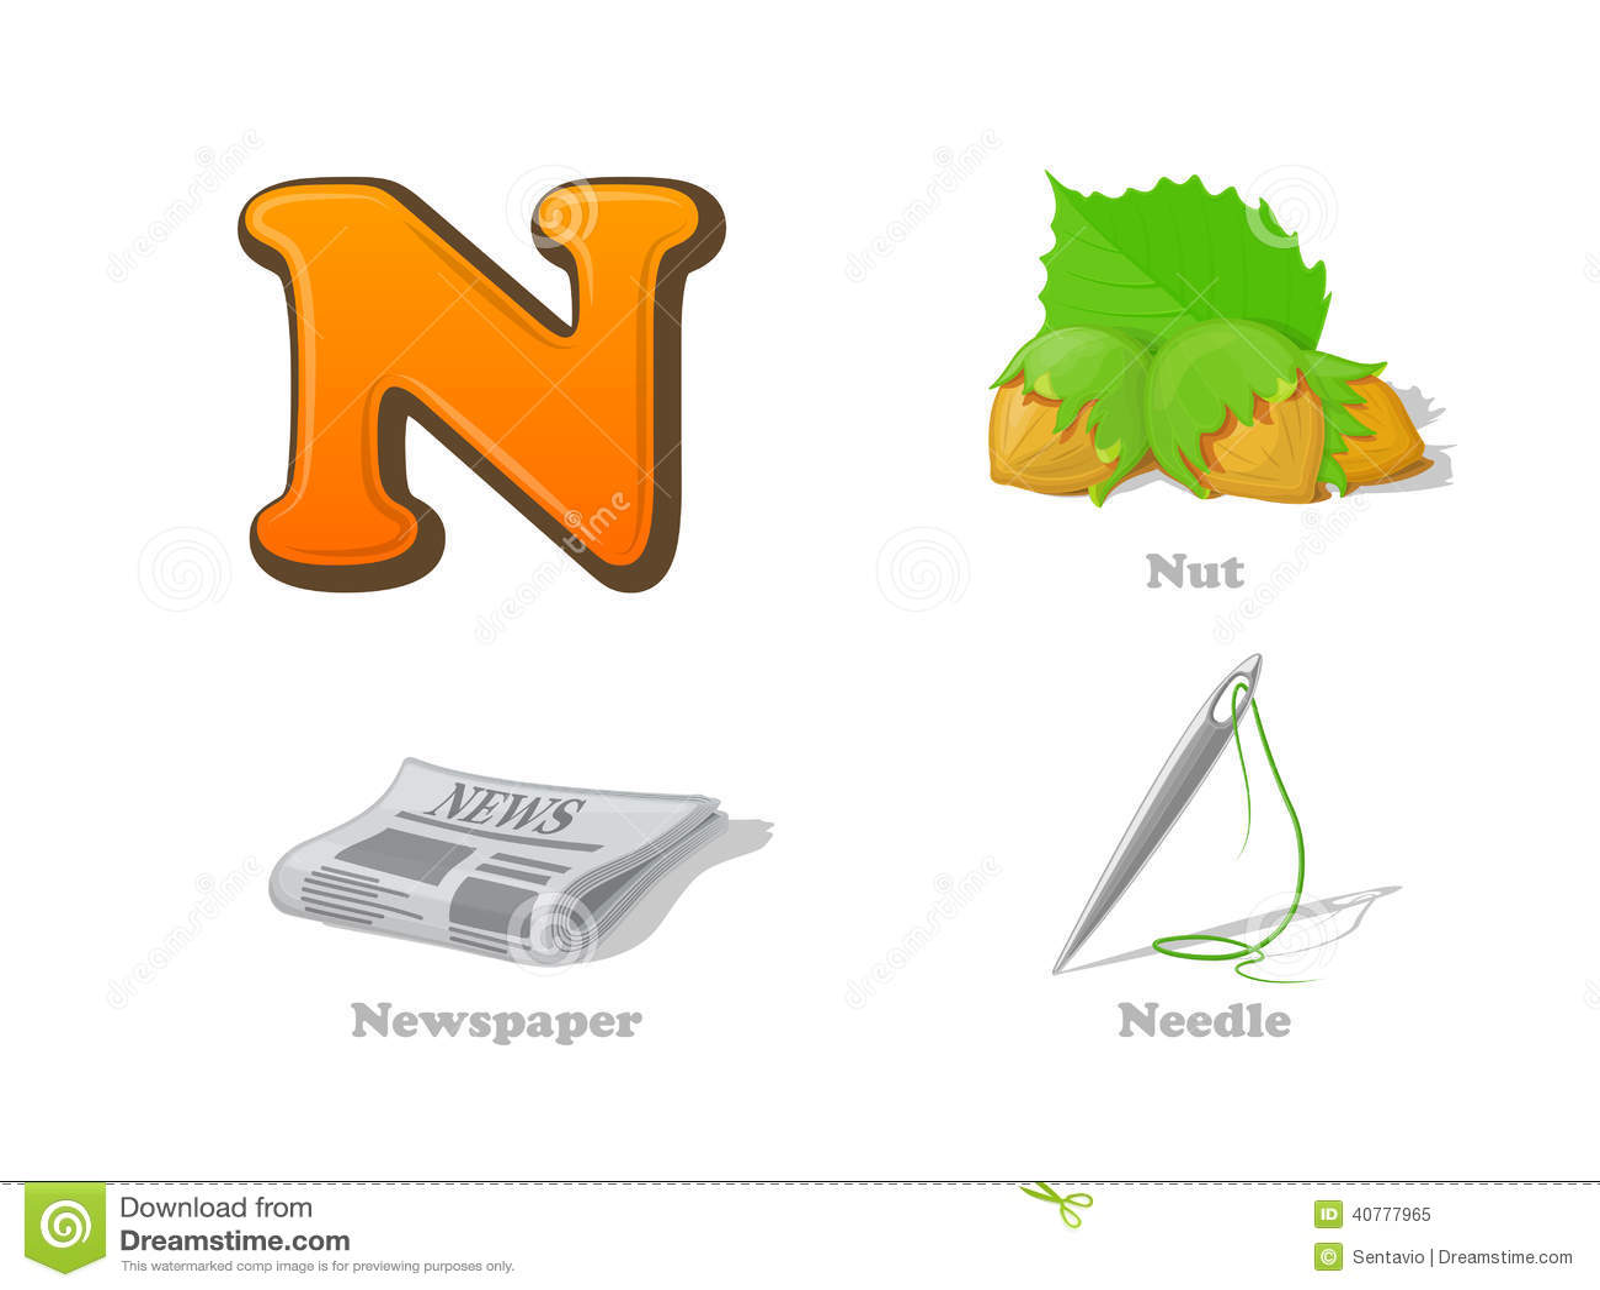 ABC Letter N Funny Kid Icons Set: Nut, Newsletter, Needle